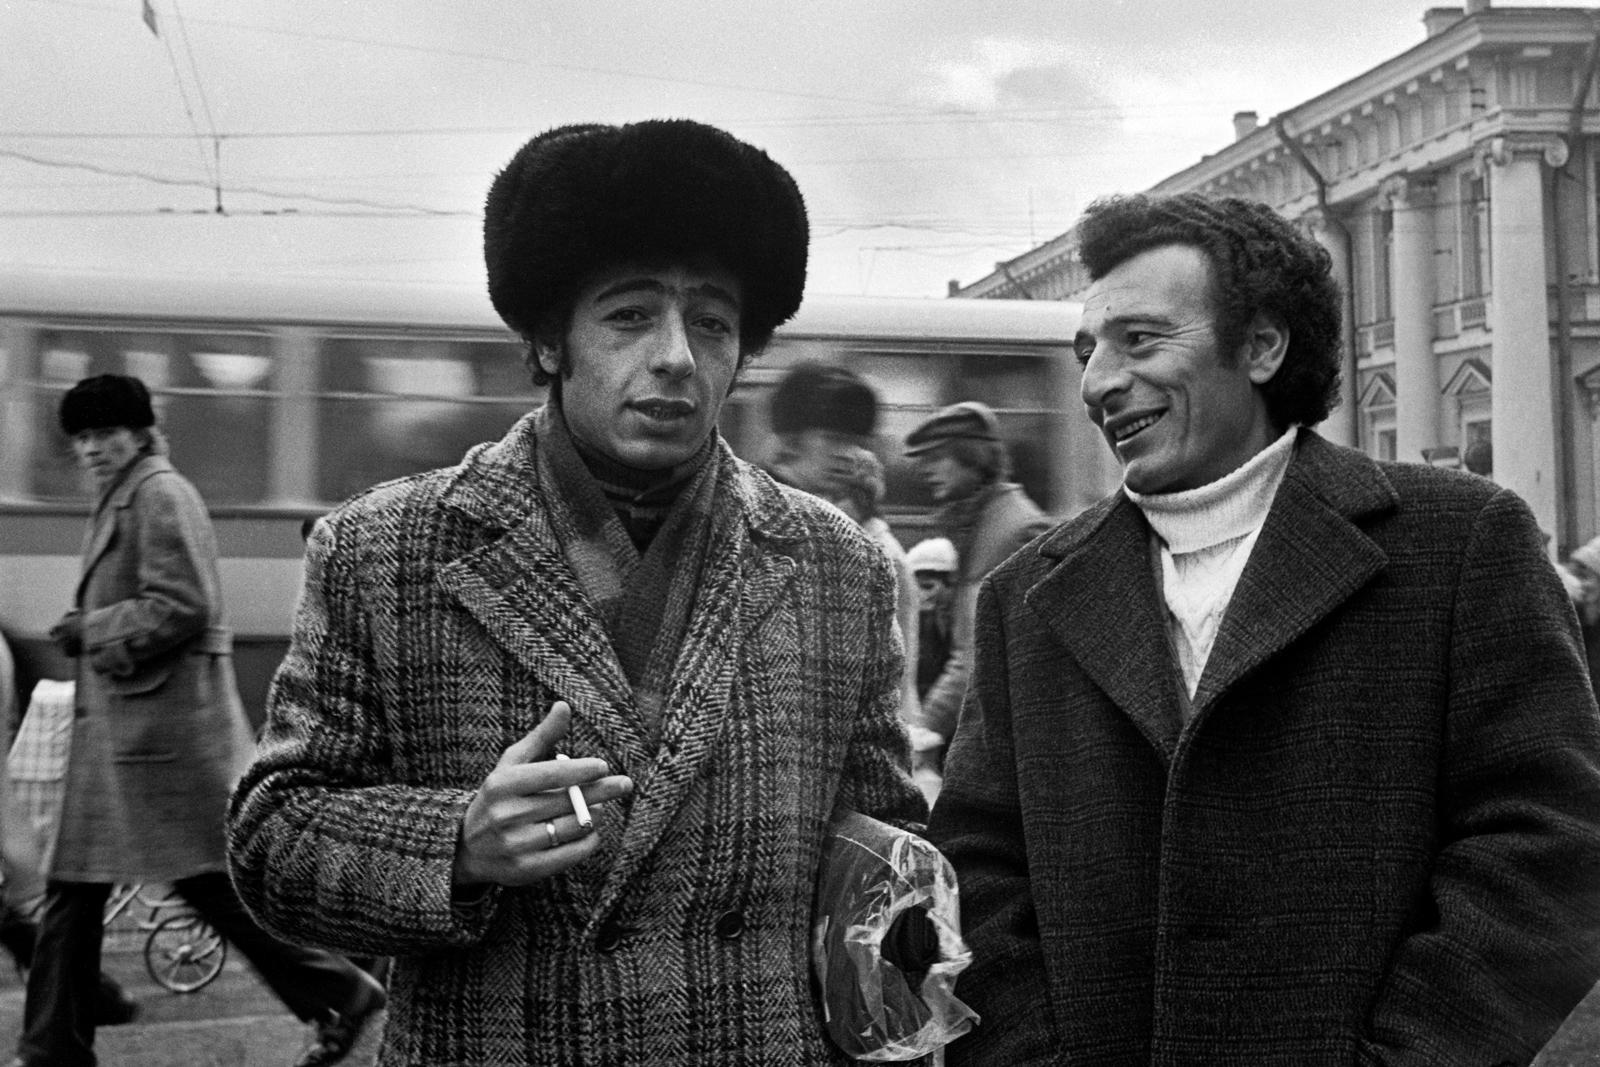 Leningrado 1976 hombres